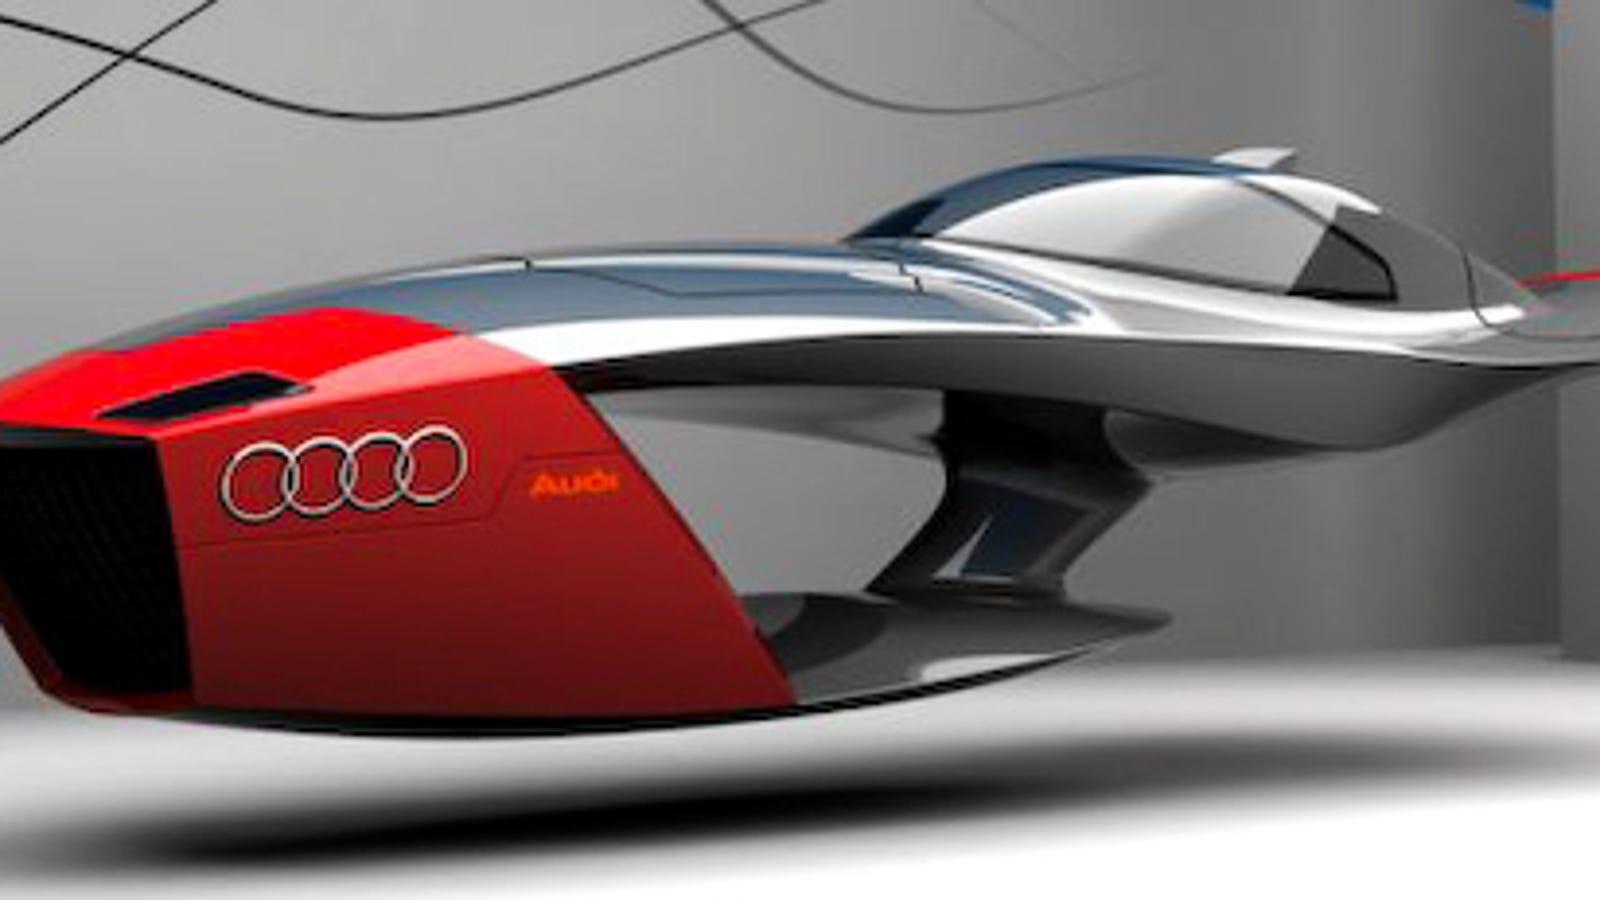 Audi Calamaro Flying Concept Car Takes Future Design